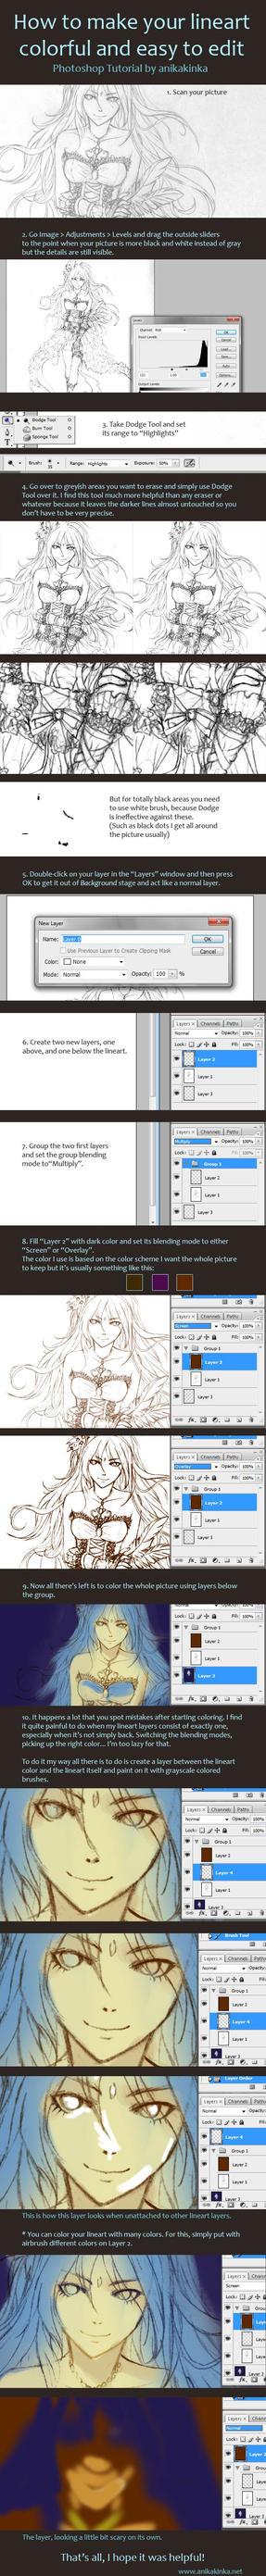 Color Lineart Tutorial by anikakinka